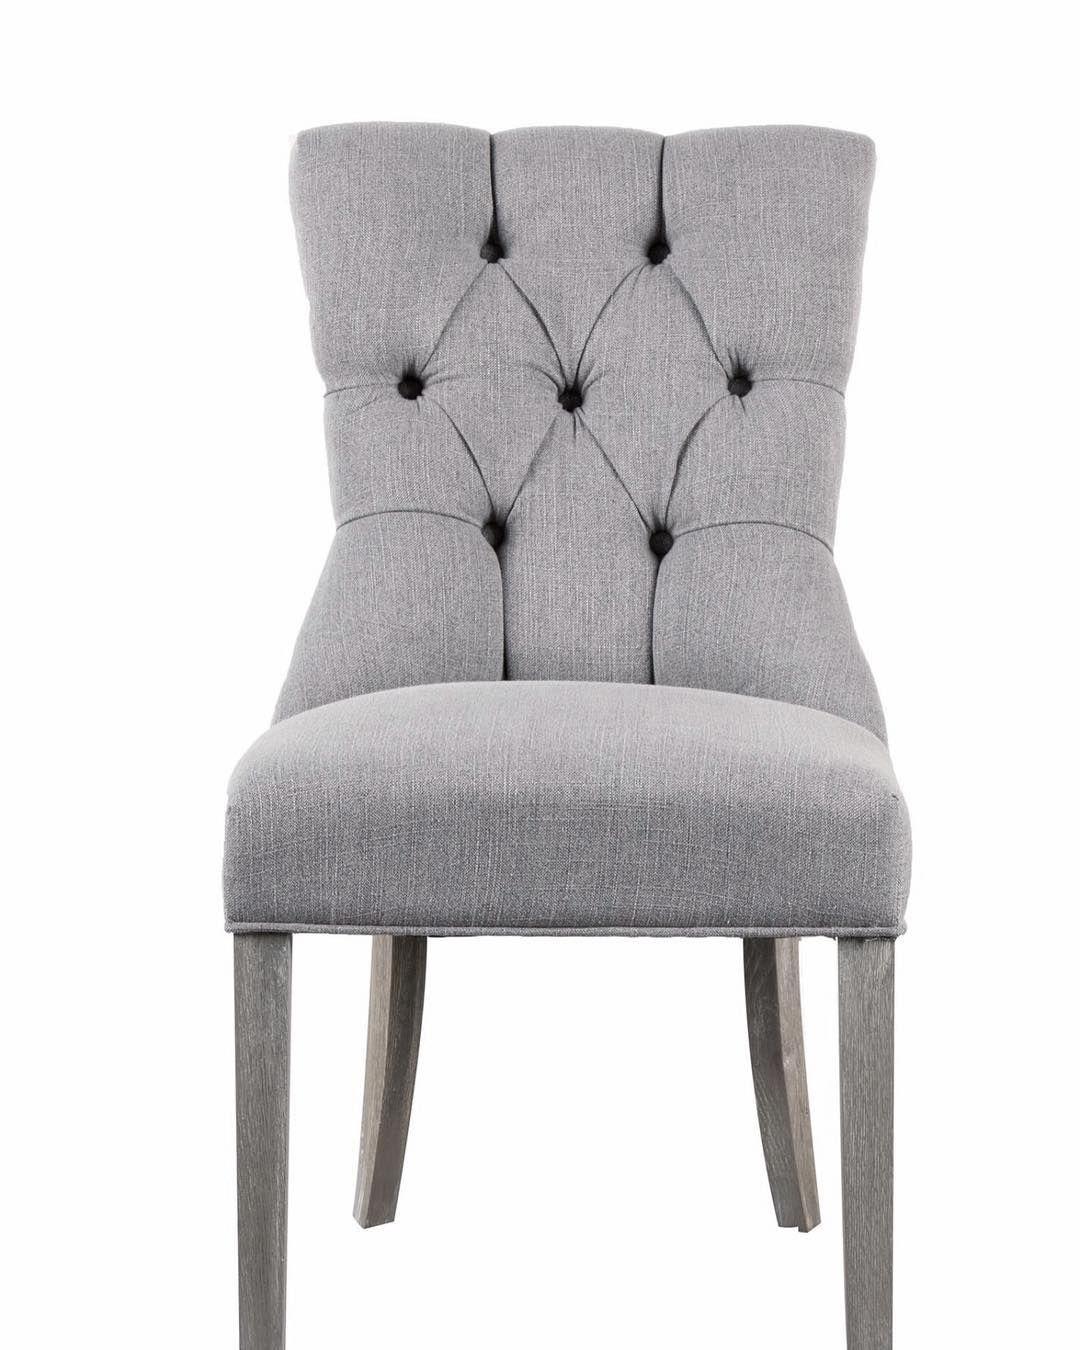 Princess  Med sølvnagler og sølvring i ryggen. Ben i gråpigmentert eik. Meget godt sittekomfort. En mindre spisestuestol som er både lekker og har flotte detaljer.  #spisestuestol #classicliving